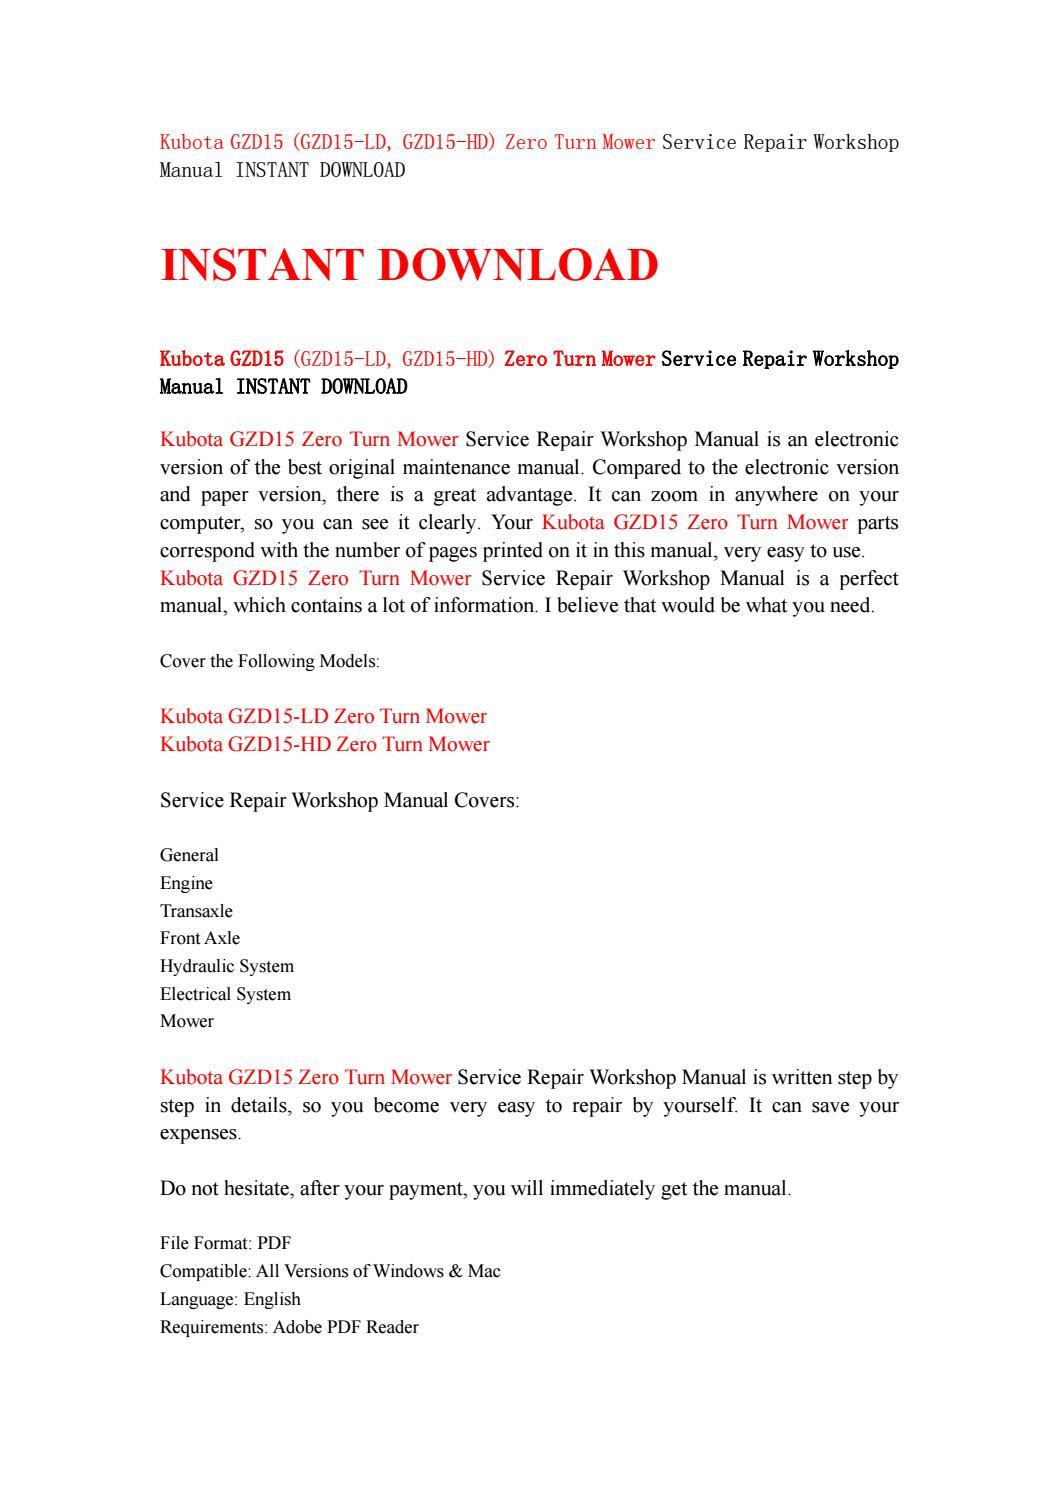 Kubota gzd15 (gzd15 ld, gzd15 hd) zero turn mower service repair workshop  manual instant download by kfjsjfnsef - issuu